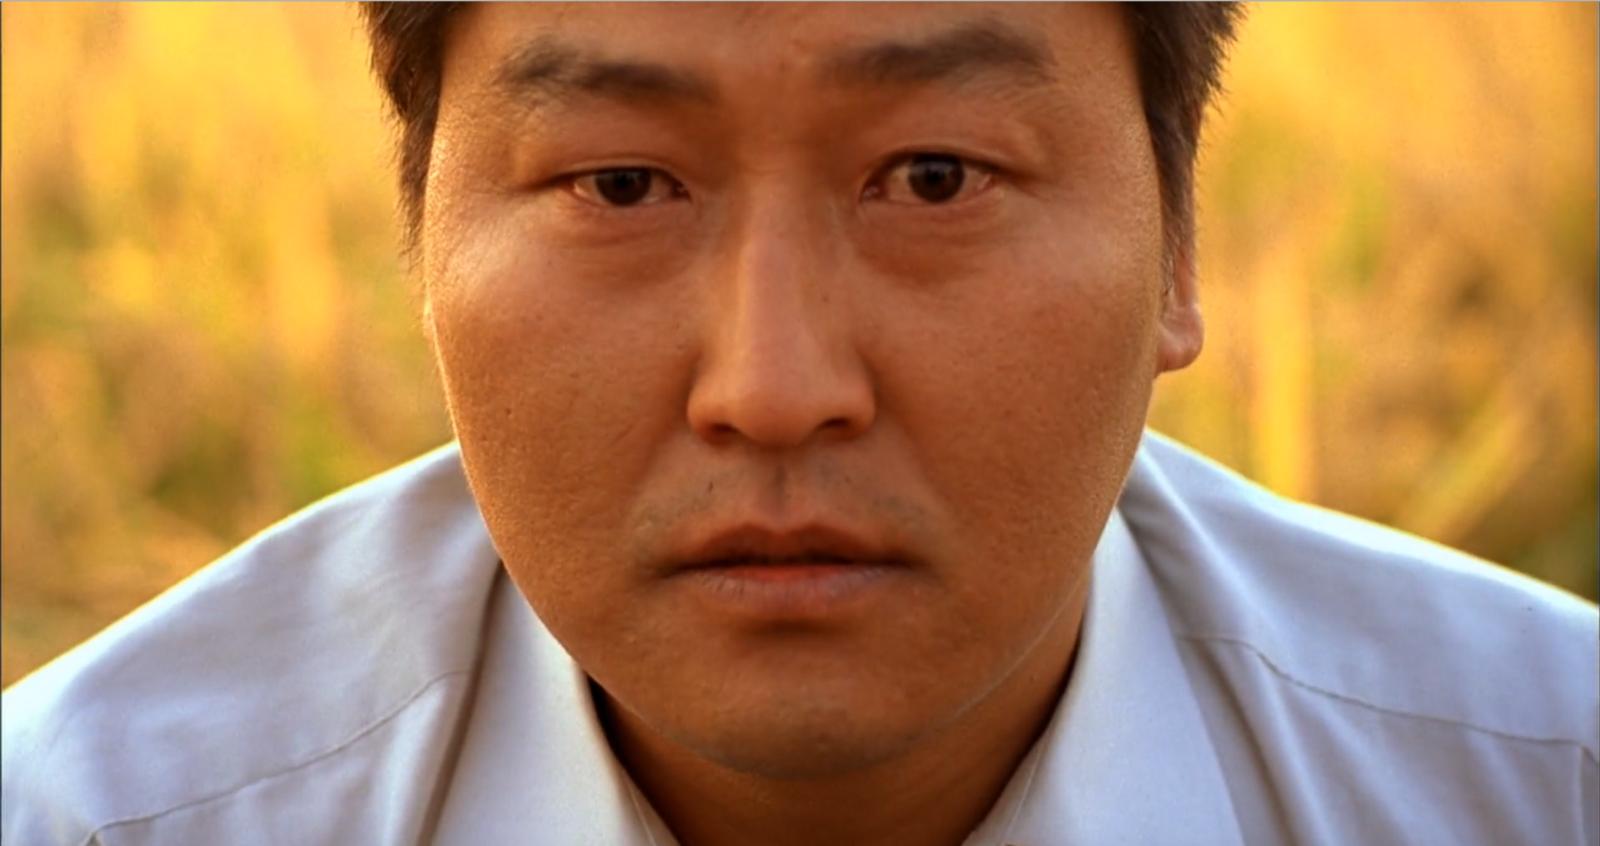 Song Kang Ho in Memories of Murder by Bong Joon Ho